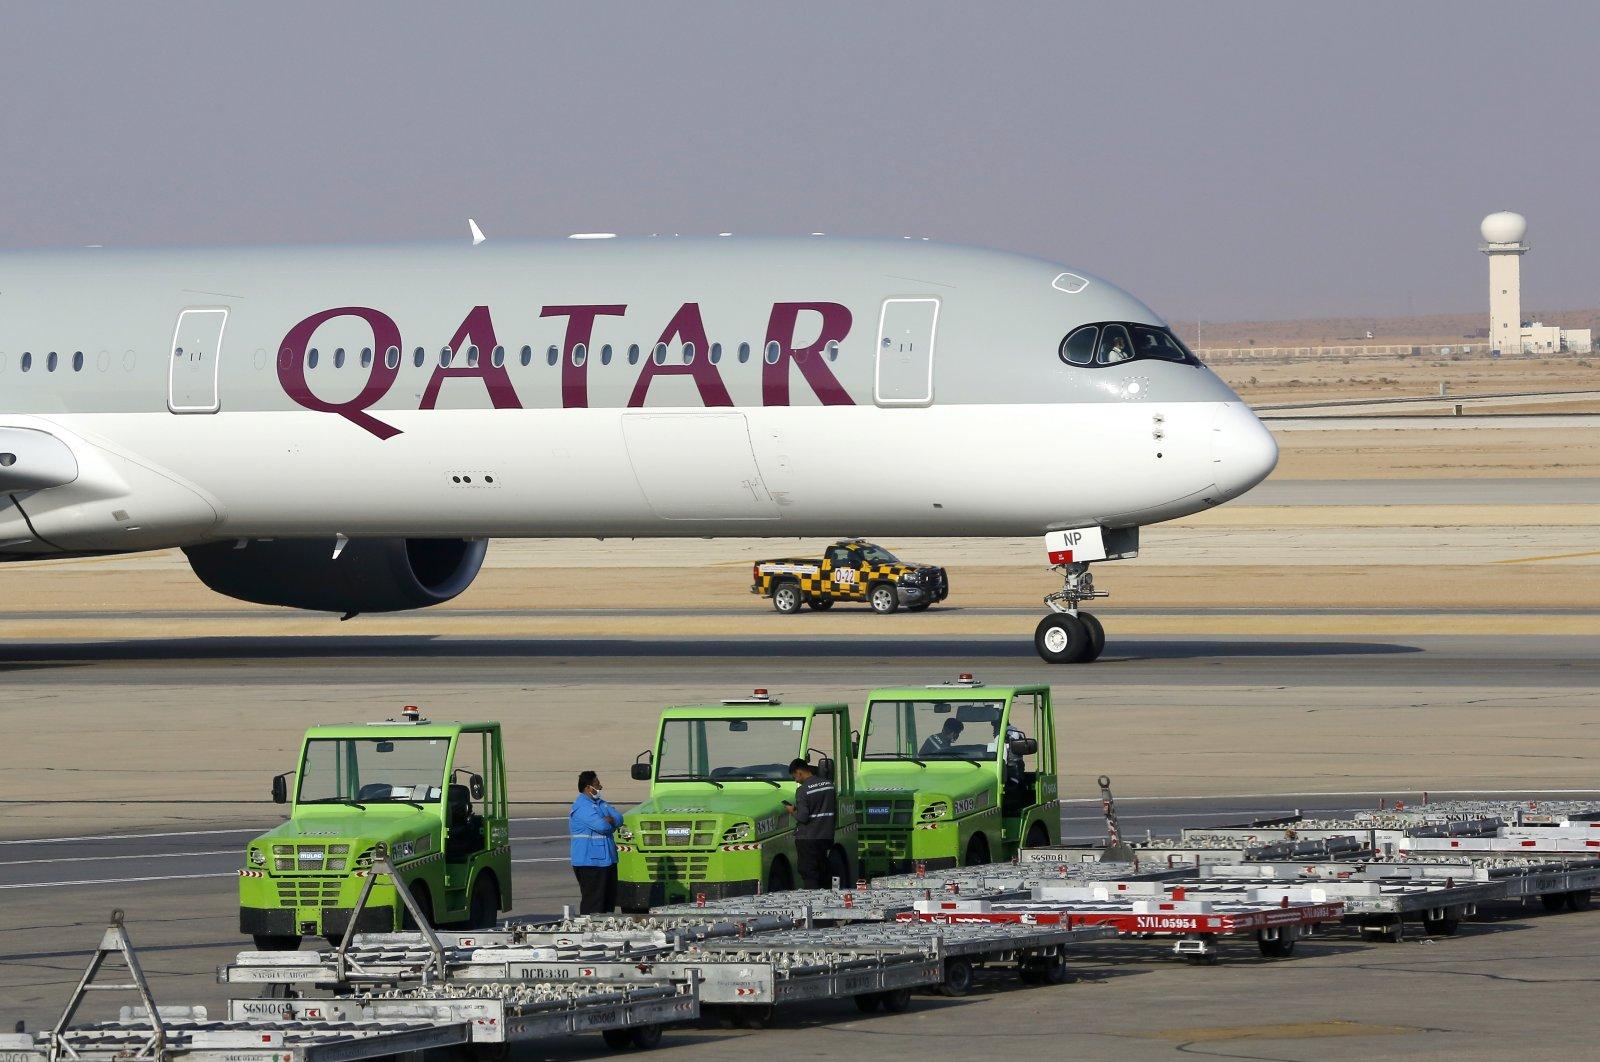 The first Qatar Airways plane in three years to land at King Khalid Airport in Riyadh, Saudi Arabia, Jan. 11, 2021. (AP Photo)